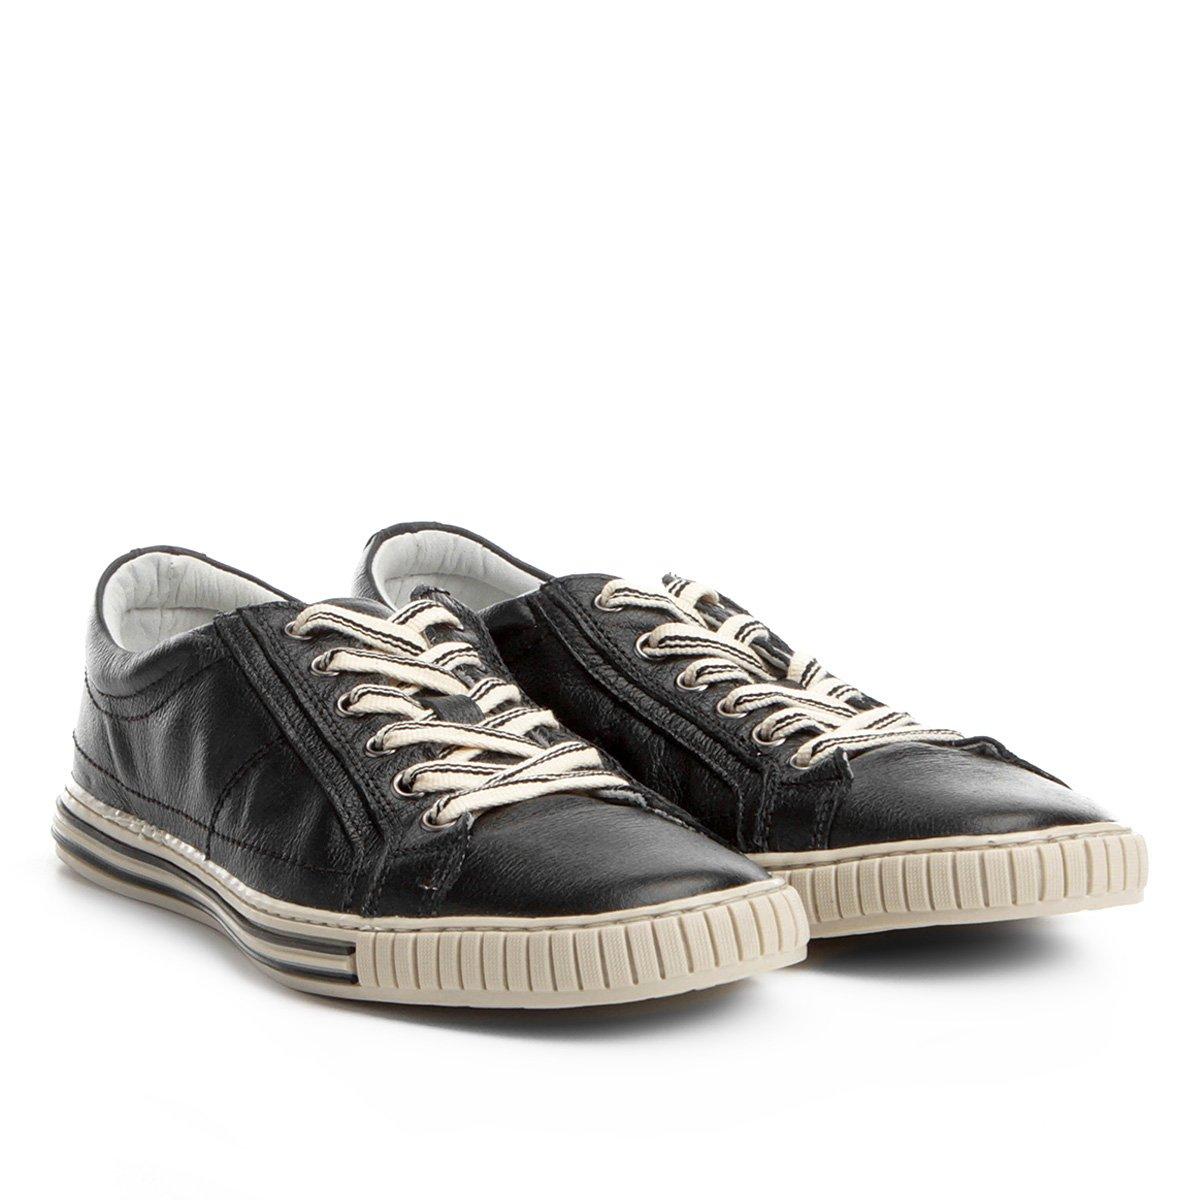 ae8d8083dc Sapatênis Couro Shoestock Listras Masculino